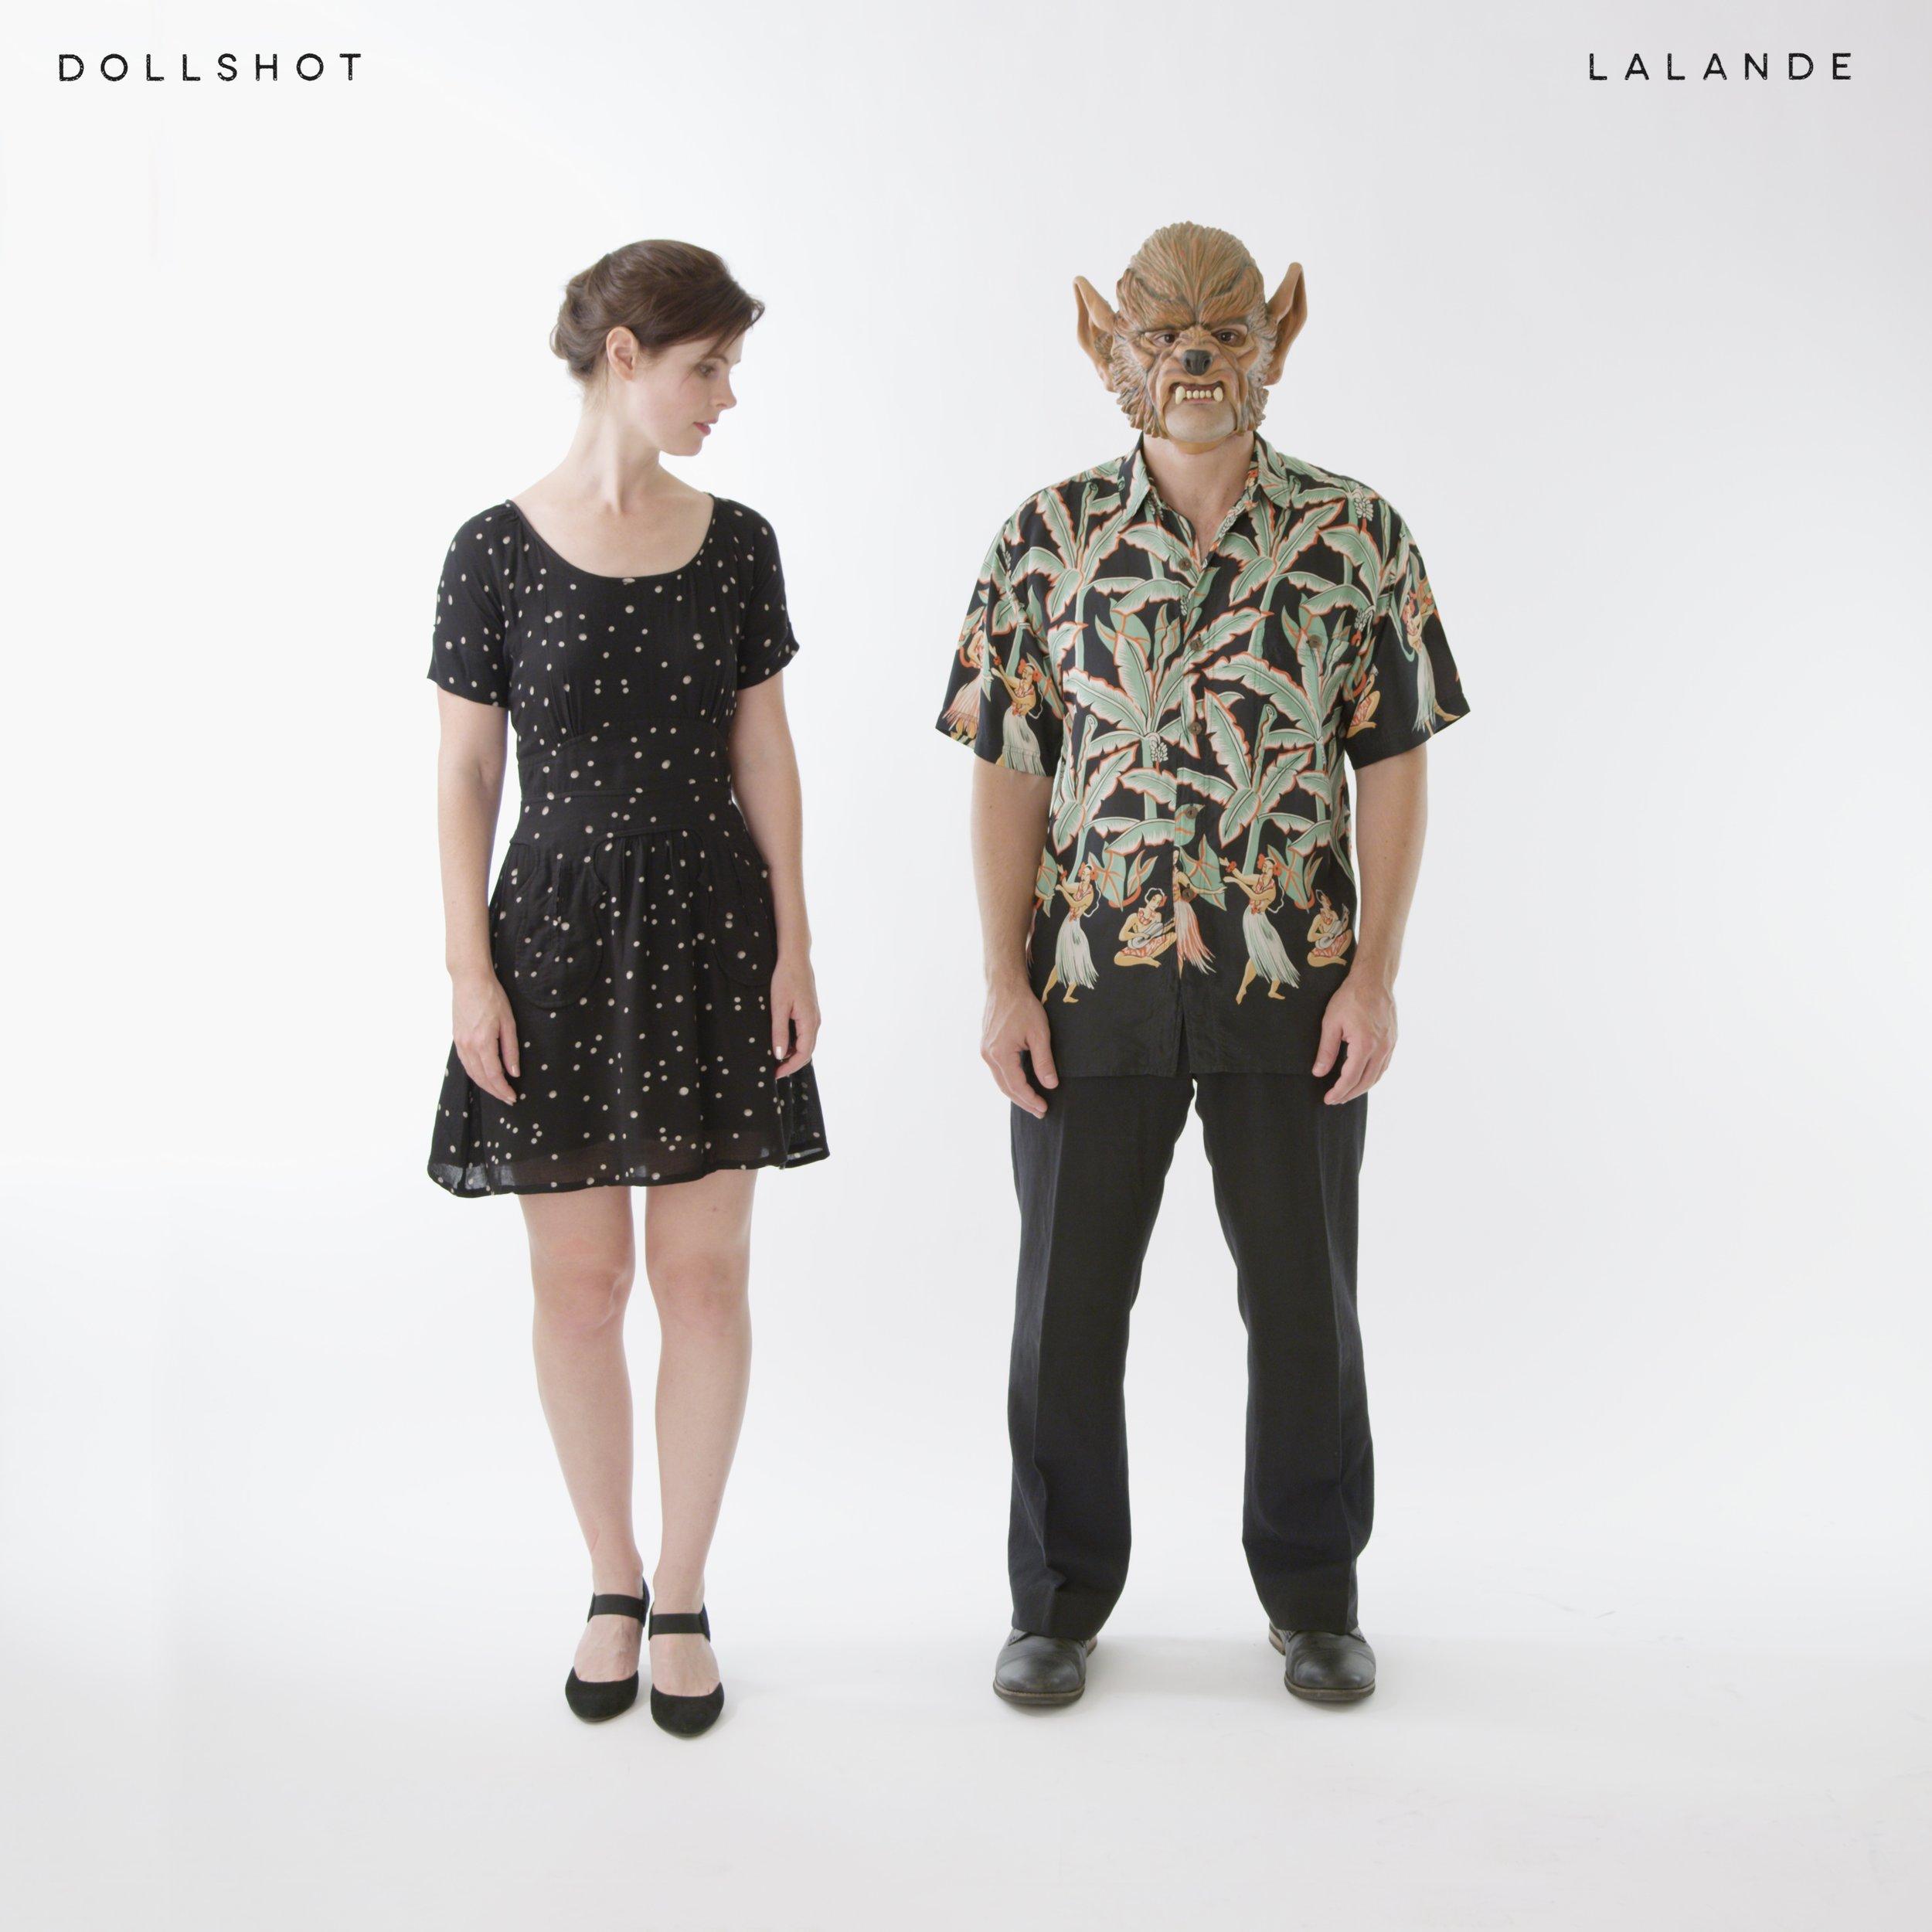 Dollshot_Lalande